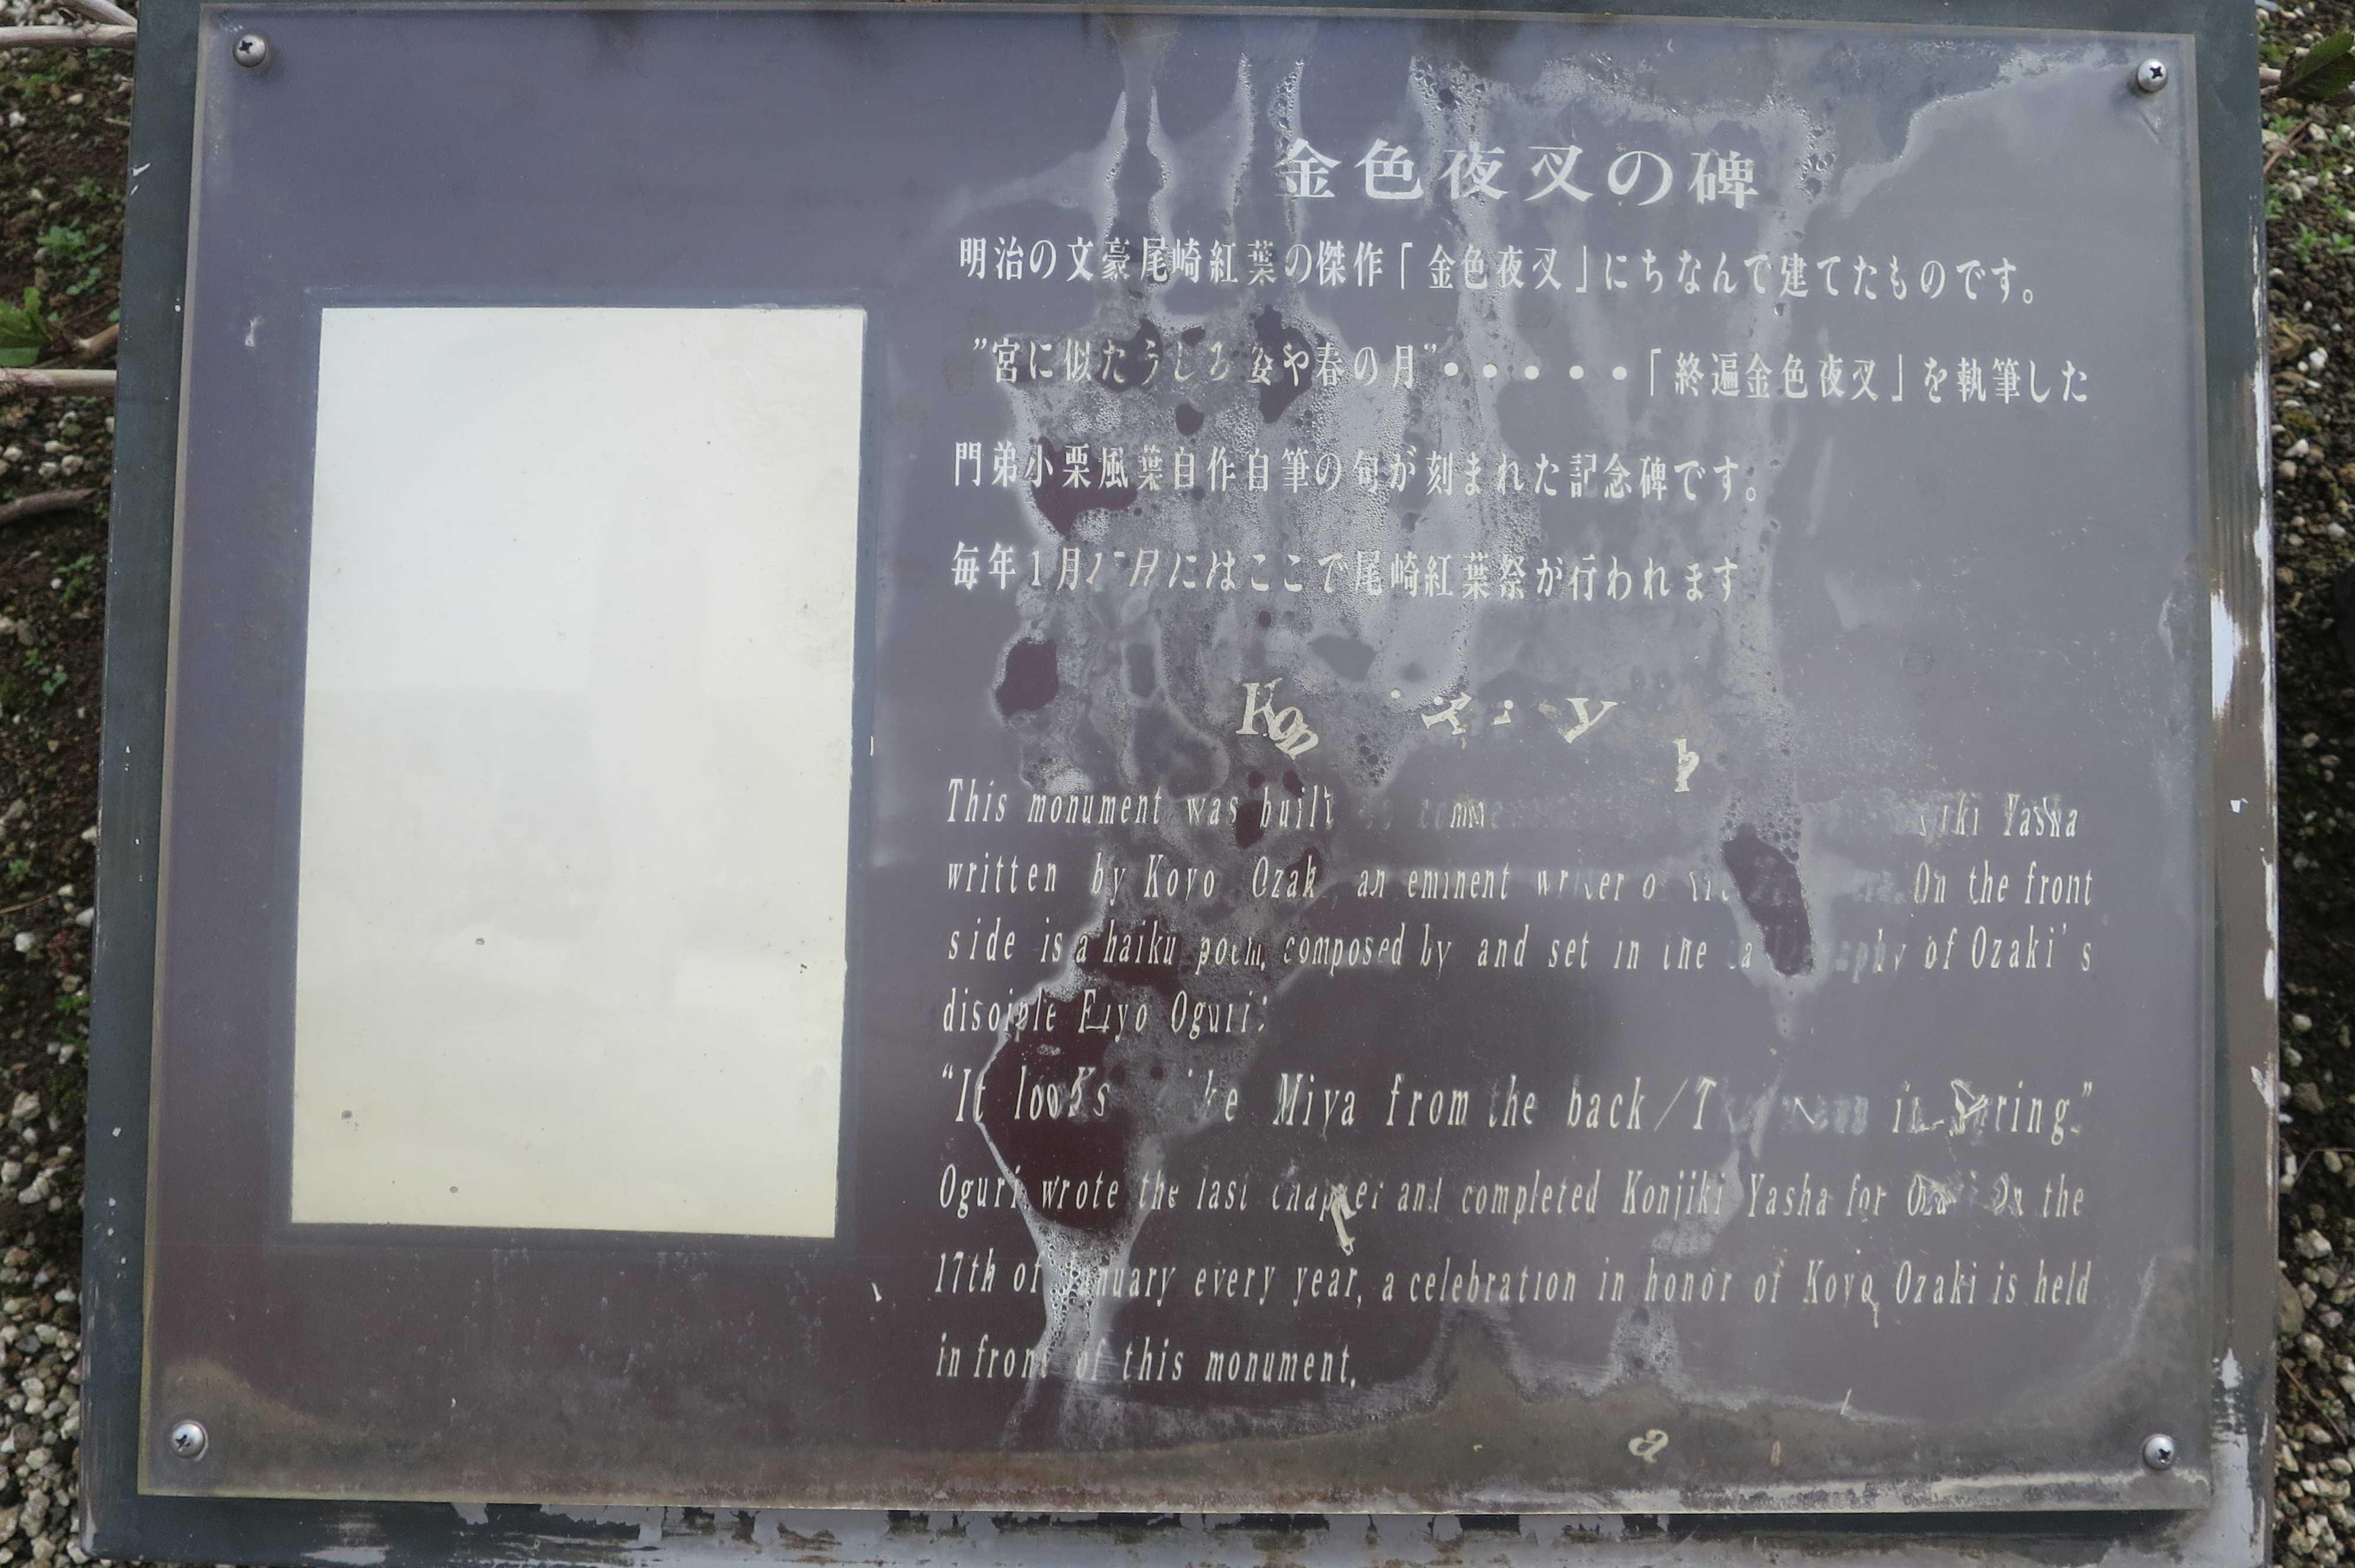 熱海 - 金色夜叉の碑